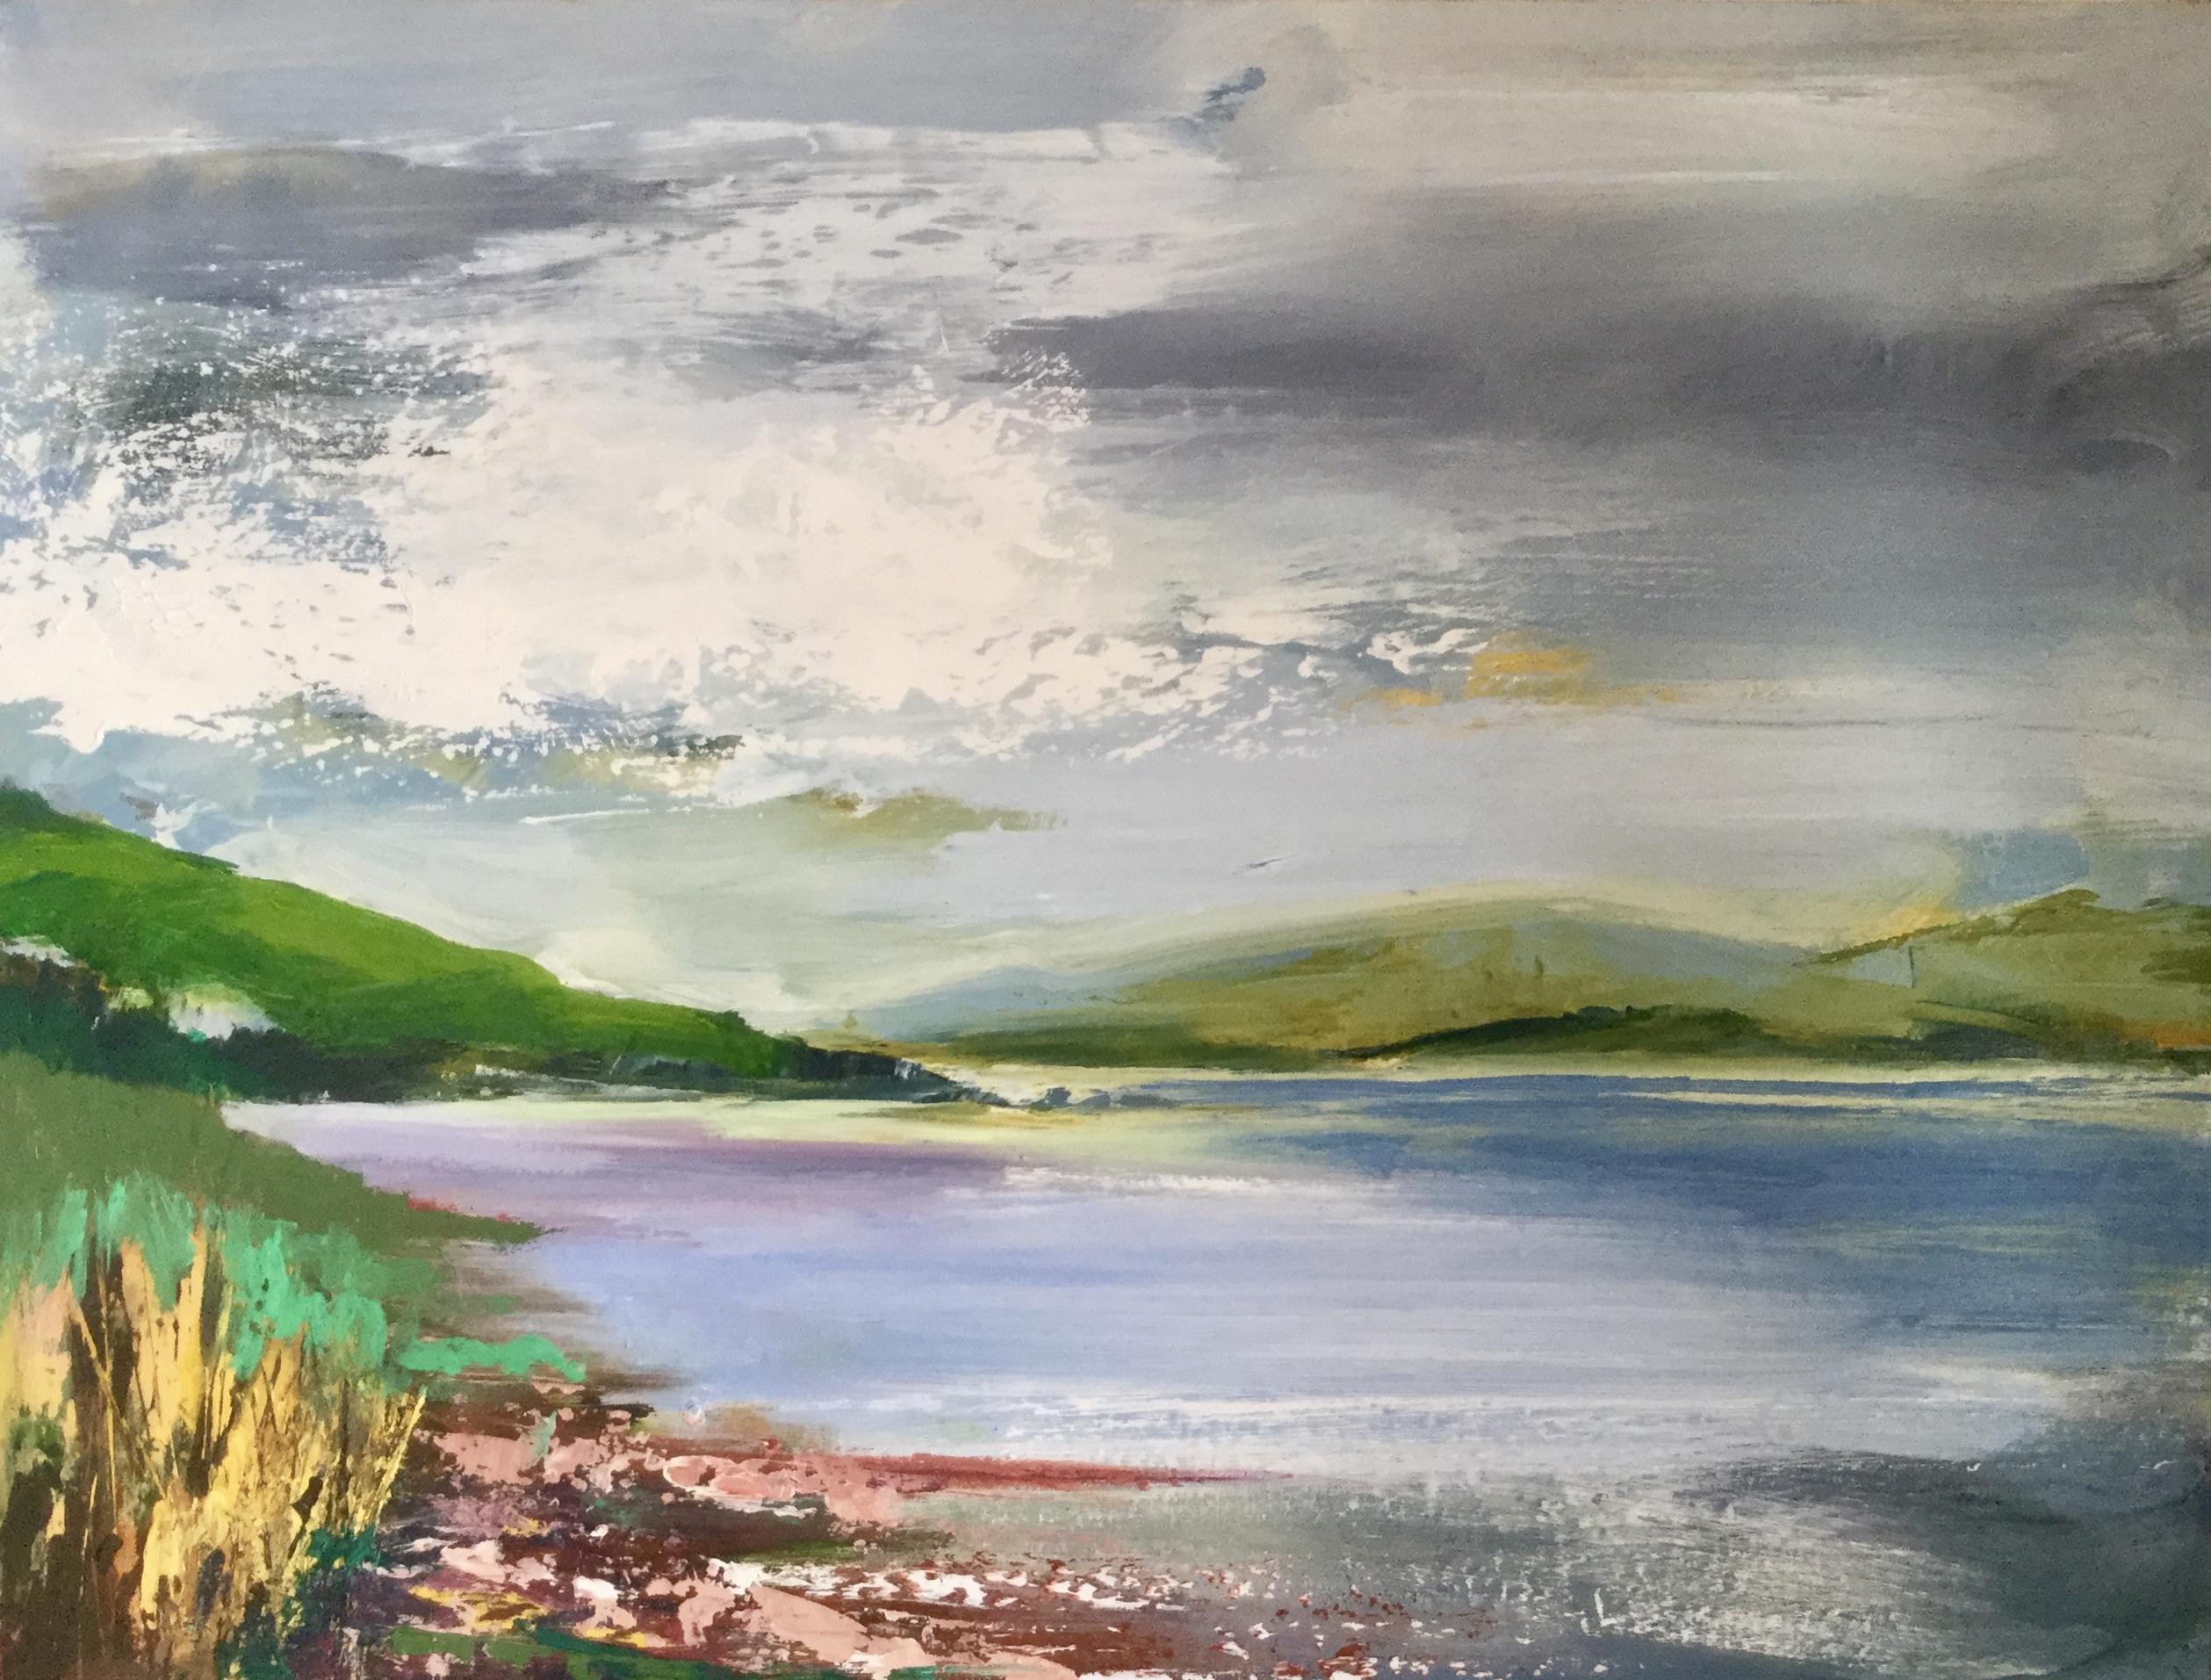 Loch Fleet, Scotland